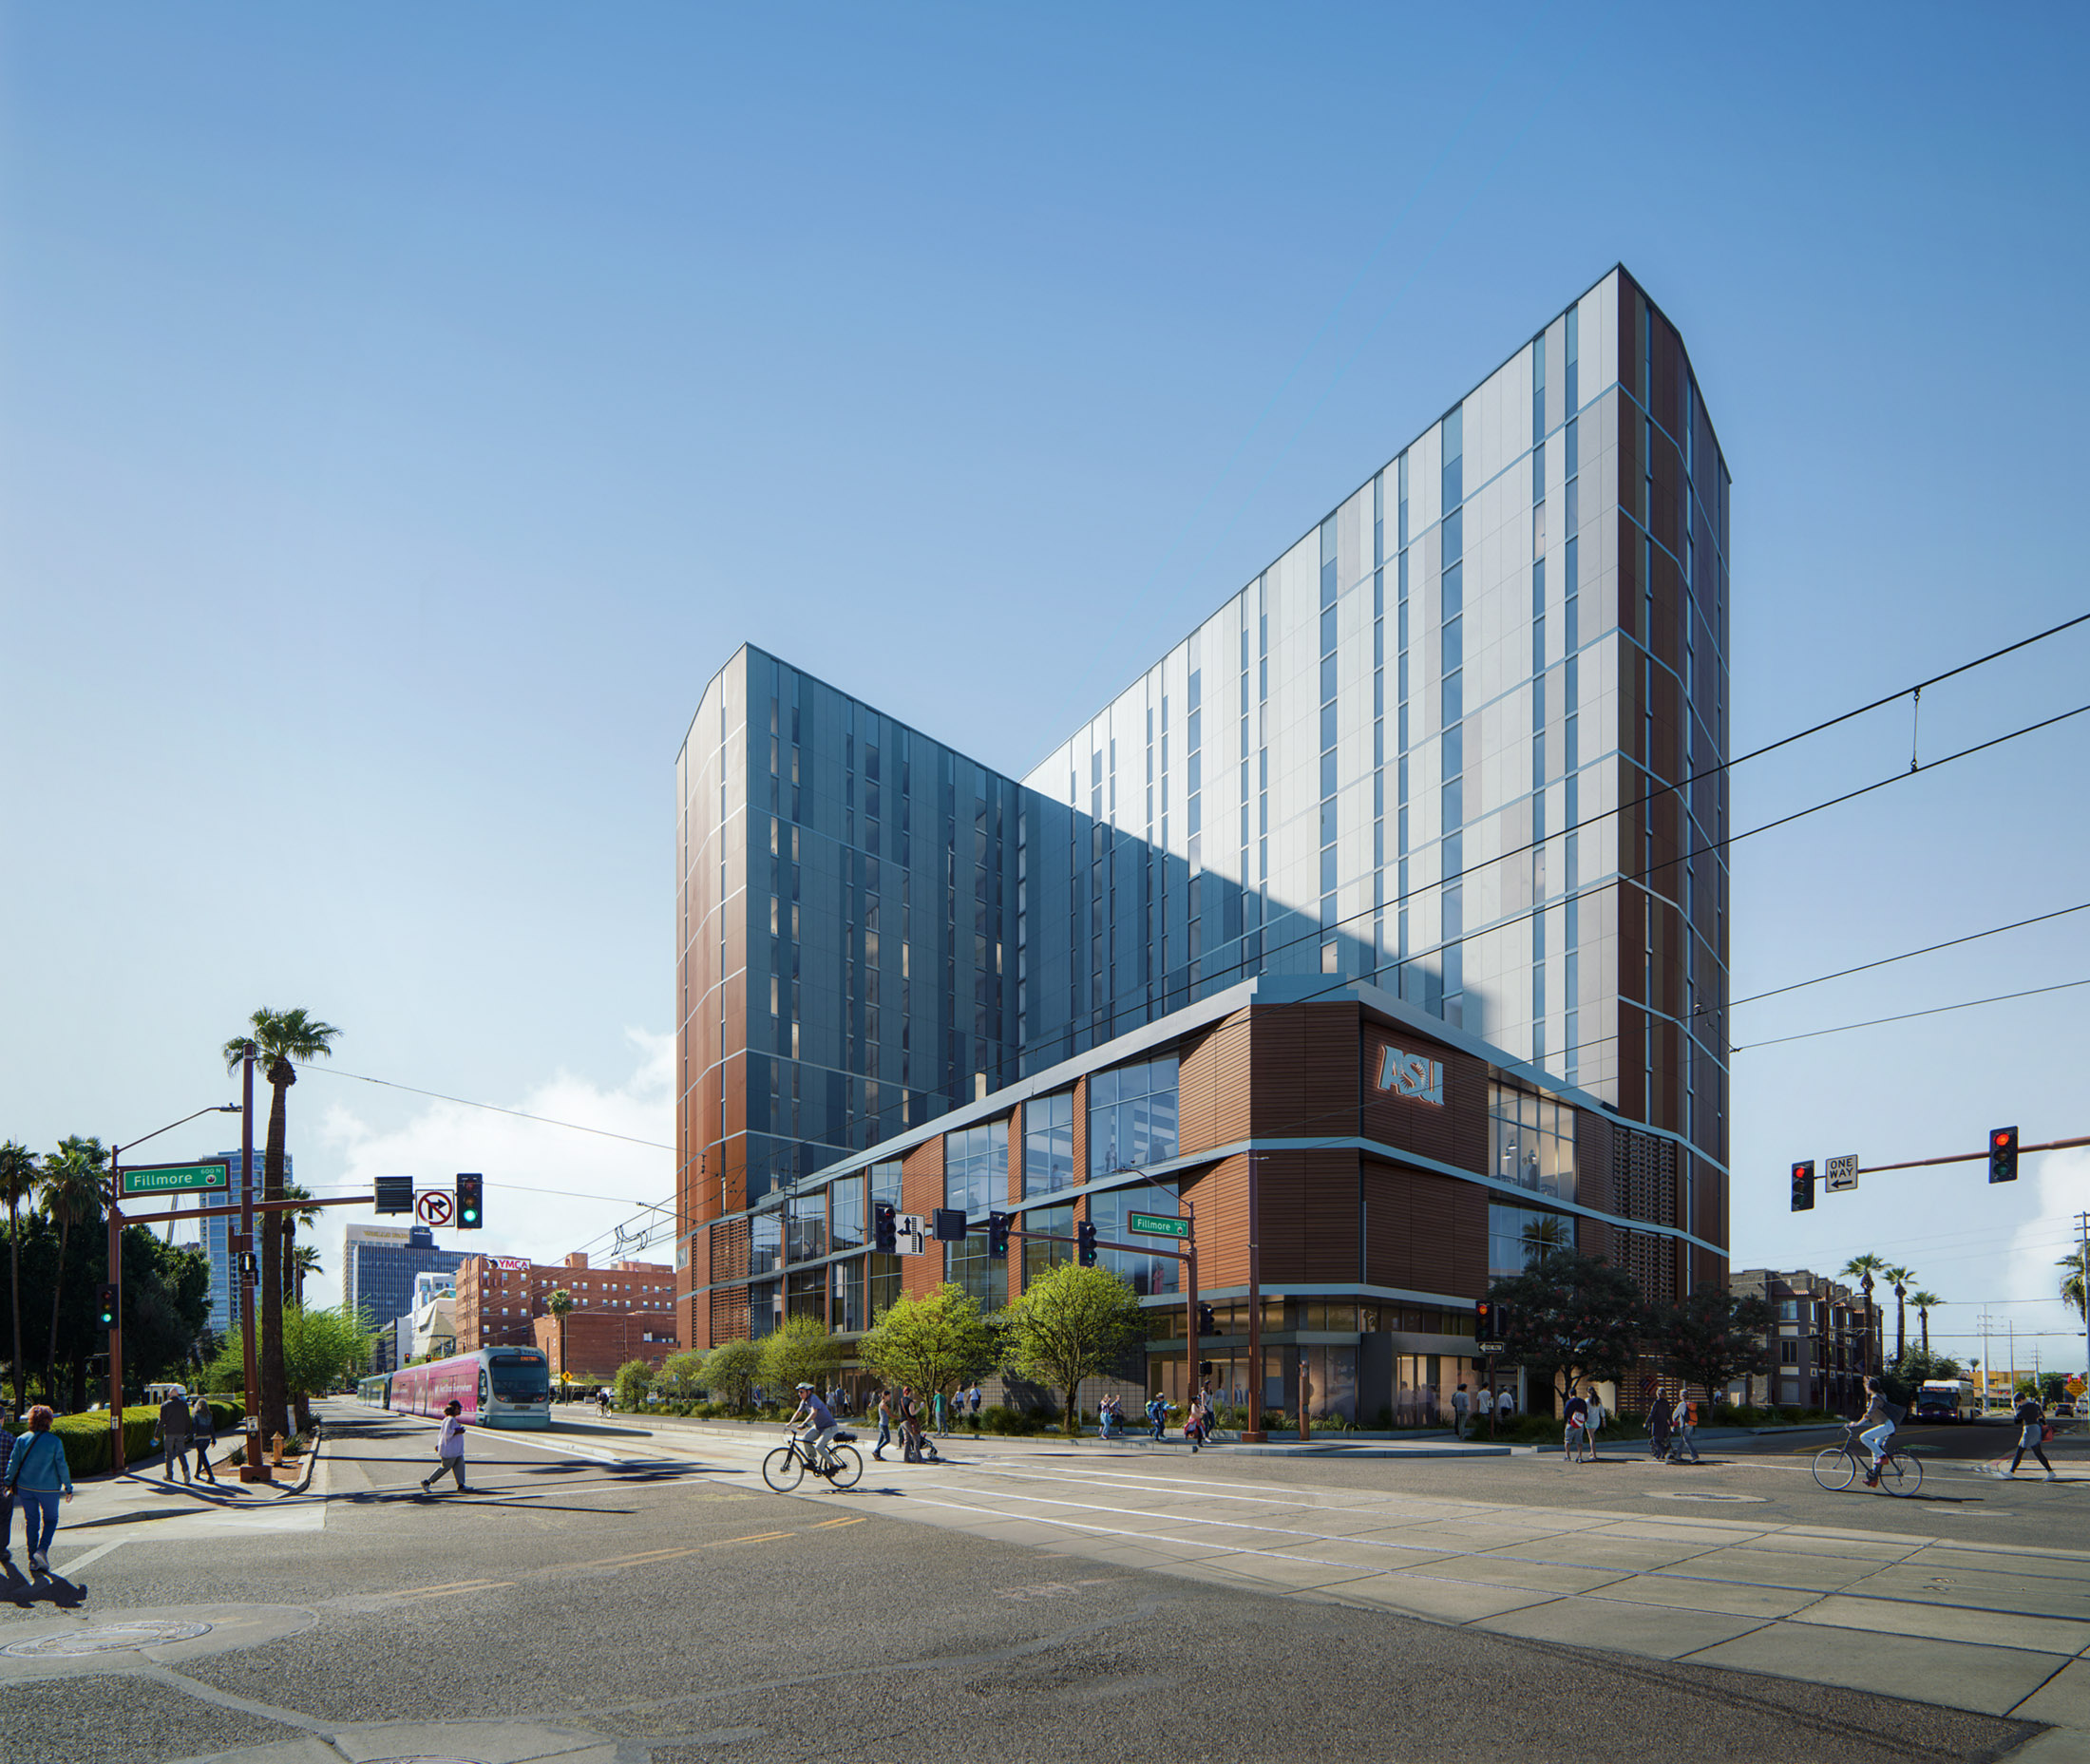 Studio MA, Live-Work Tower Complex for ASU, USA, 2019